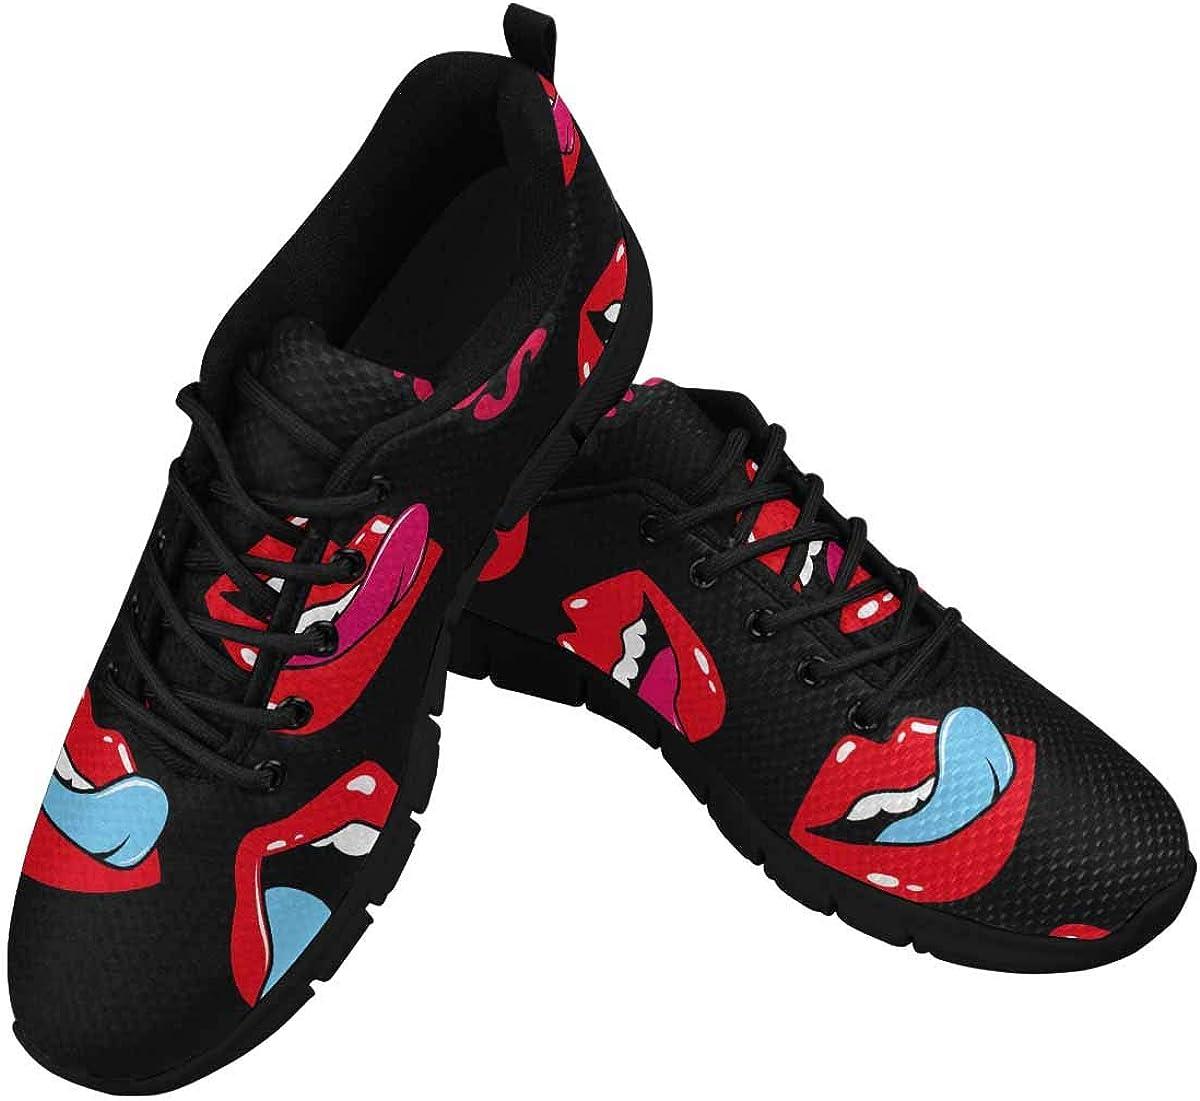 INTERESTPRINT Female Lips Kiss Mile, Tongue, Teeth Women's Athletic Mesh Breathable Casual Sneakers